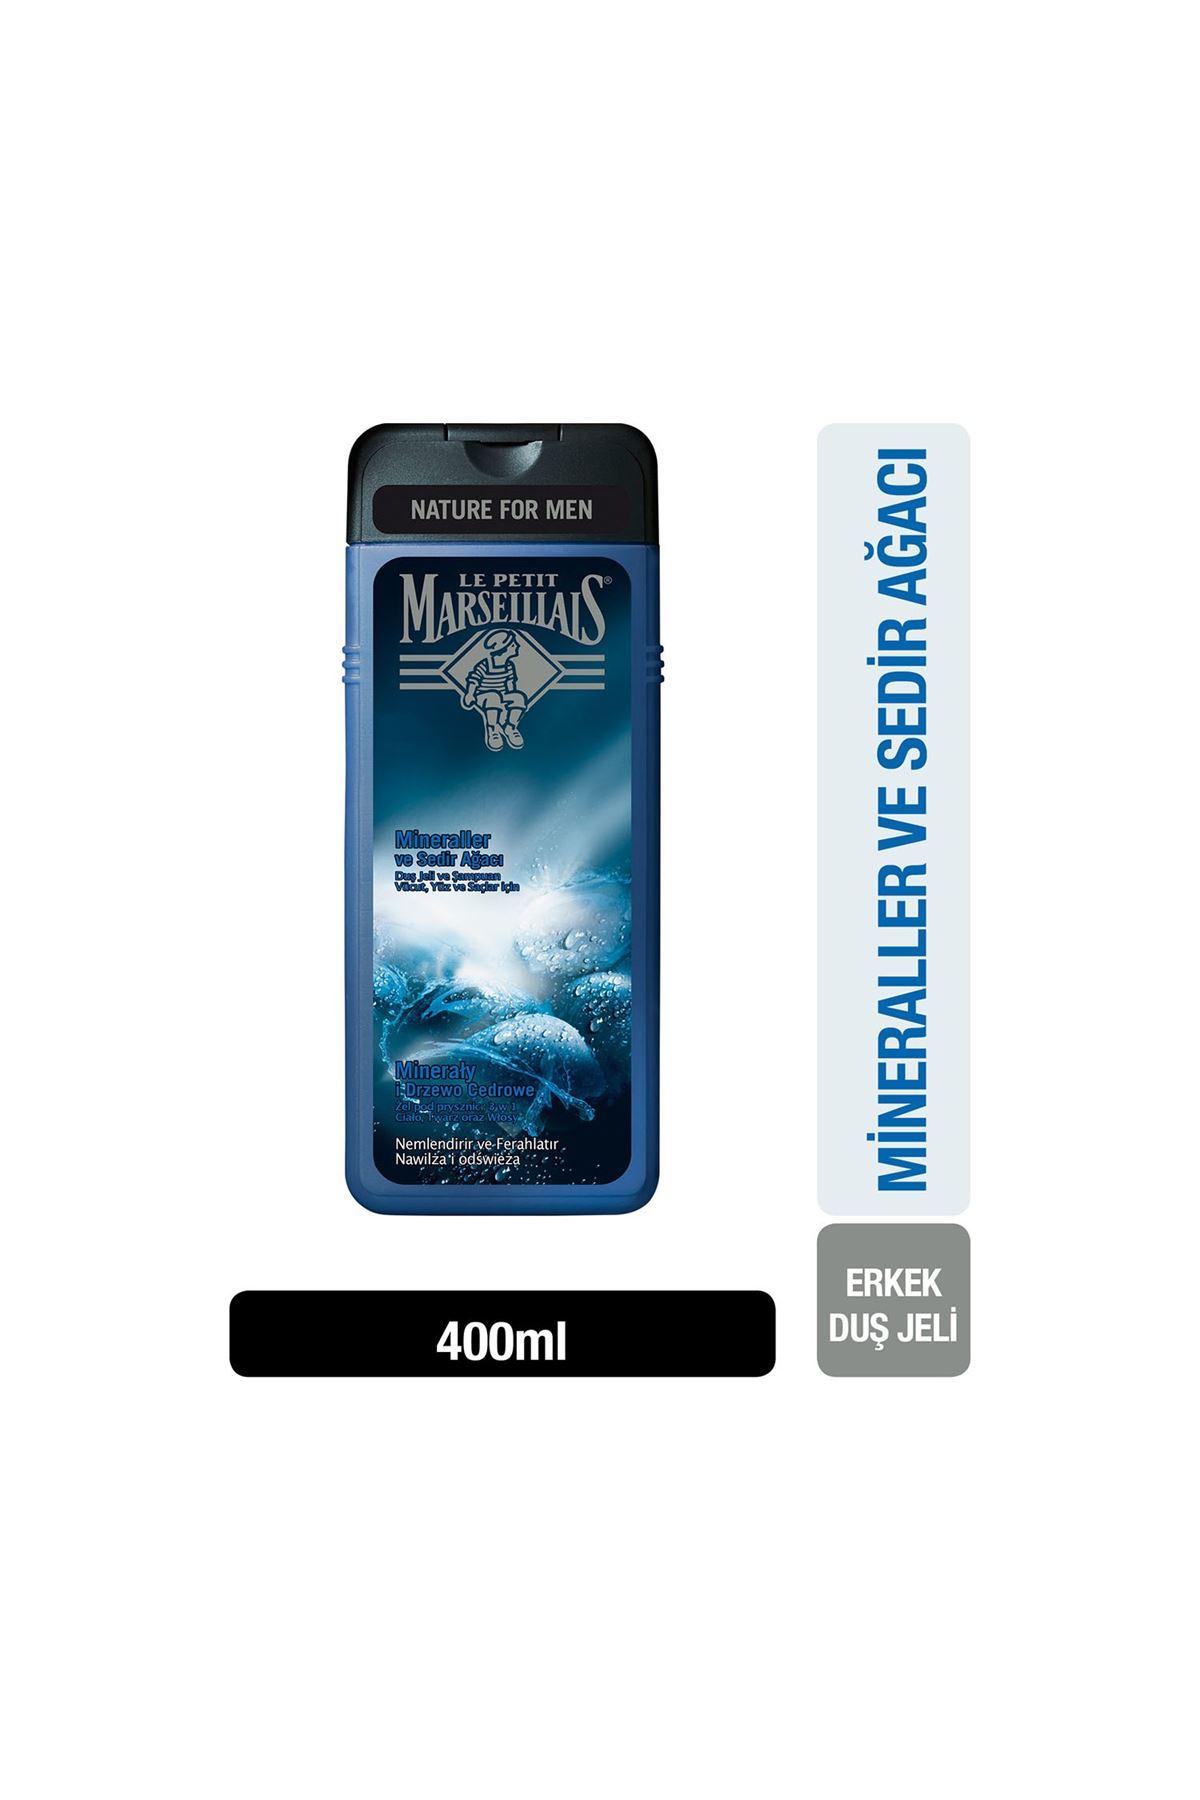 Le Petit Marseillais Mineraller Ve Sedir Ağacı Duş Jeli Men *400 ml